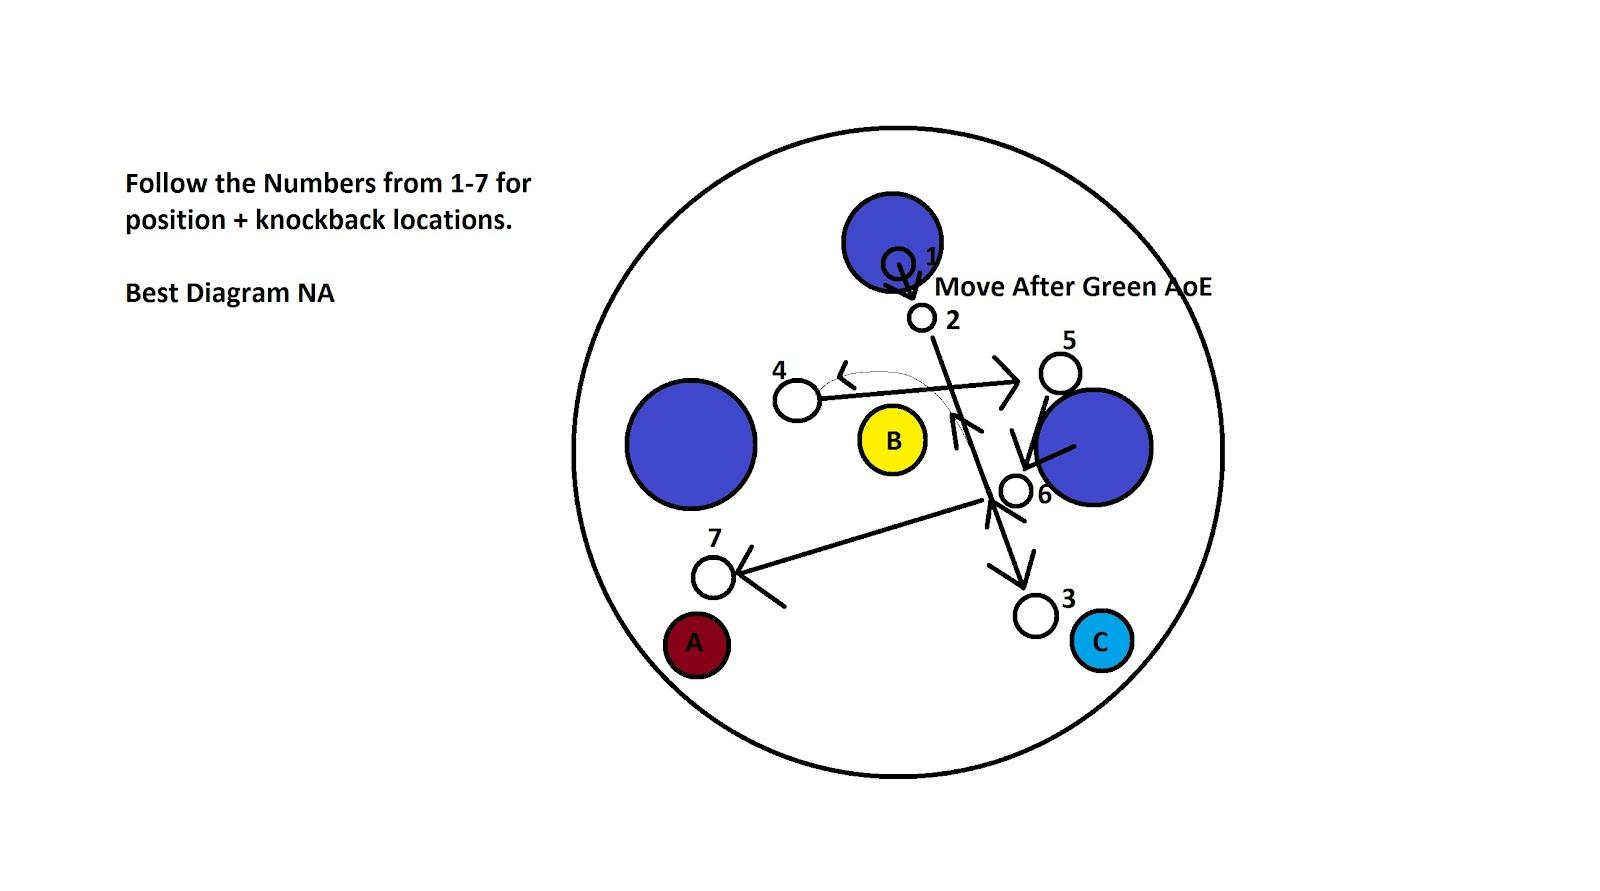 "Guia estrategia ""Sephirot extreme""  HTIFKVr5WPhtRkOEmngmbHwKGaVhprWVDsvWS57FJk34-oXYwO4lx3zqRL_62JSQ4DOITL0eHgfL8IxeWDczrPOwb2adT-BTmEAMcHS8_yEBhsPaLS3f20De6DC4smWLgg"